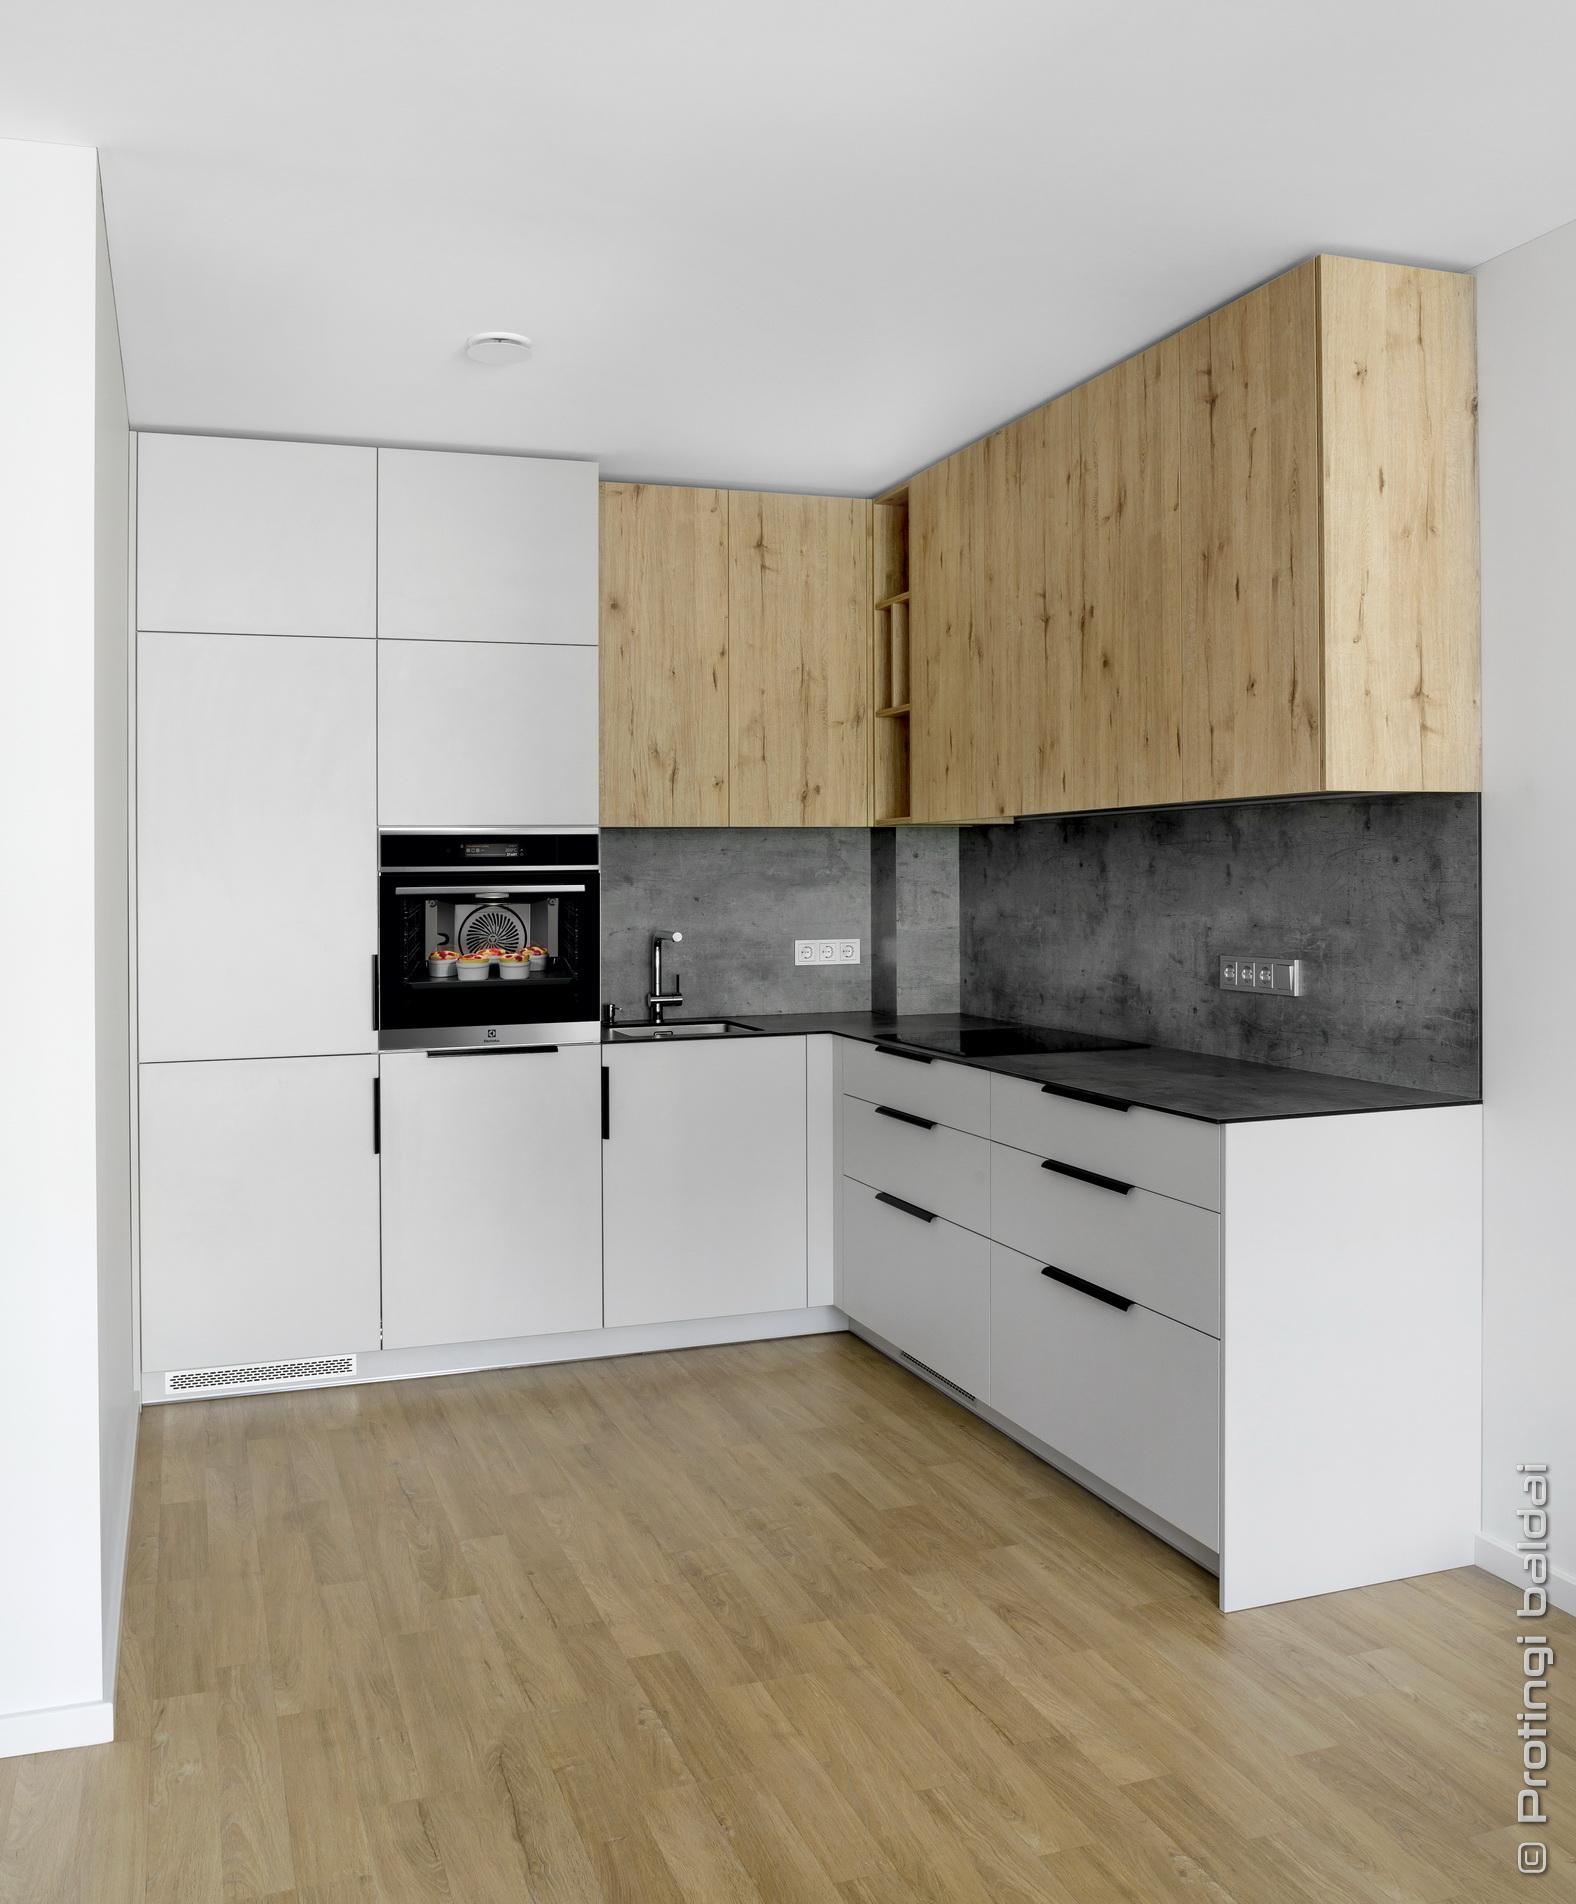 virtuves_baldai_PB29-02